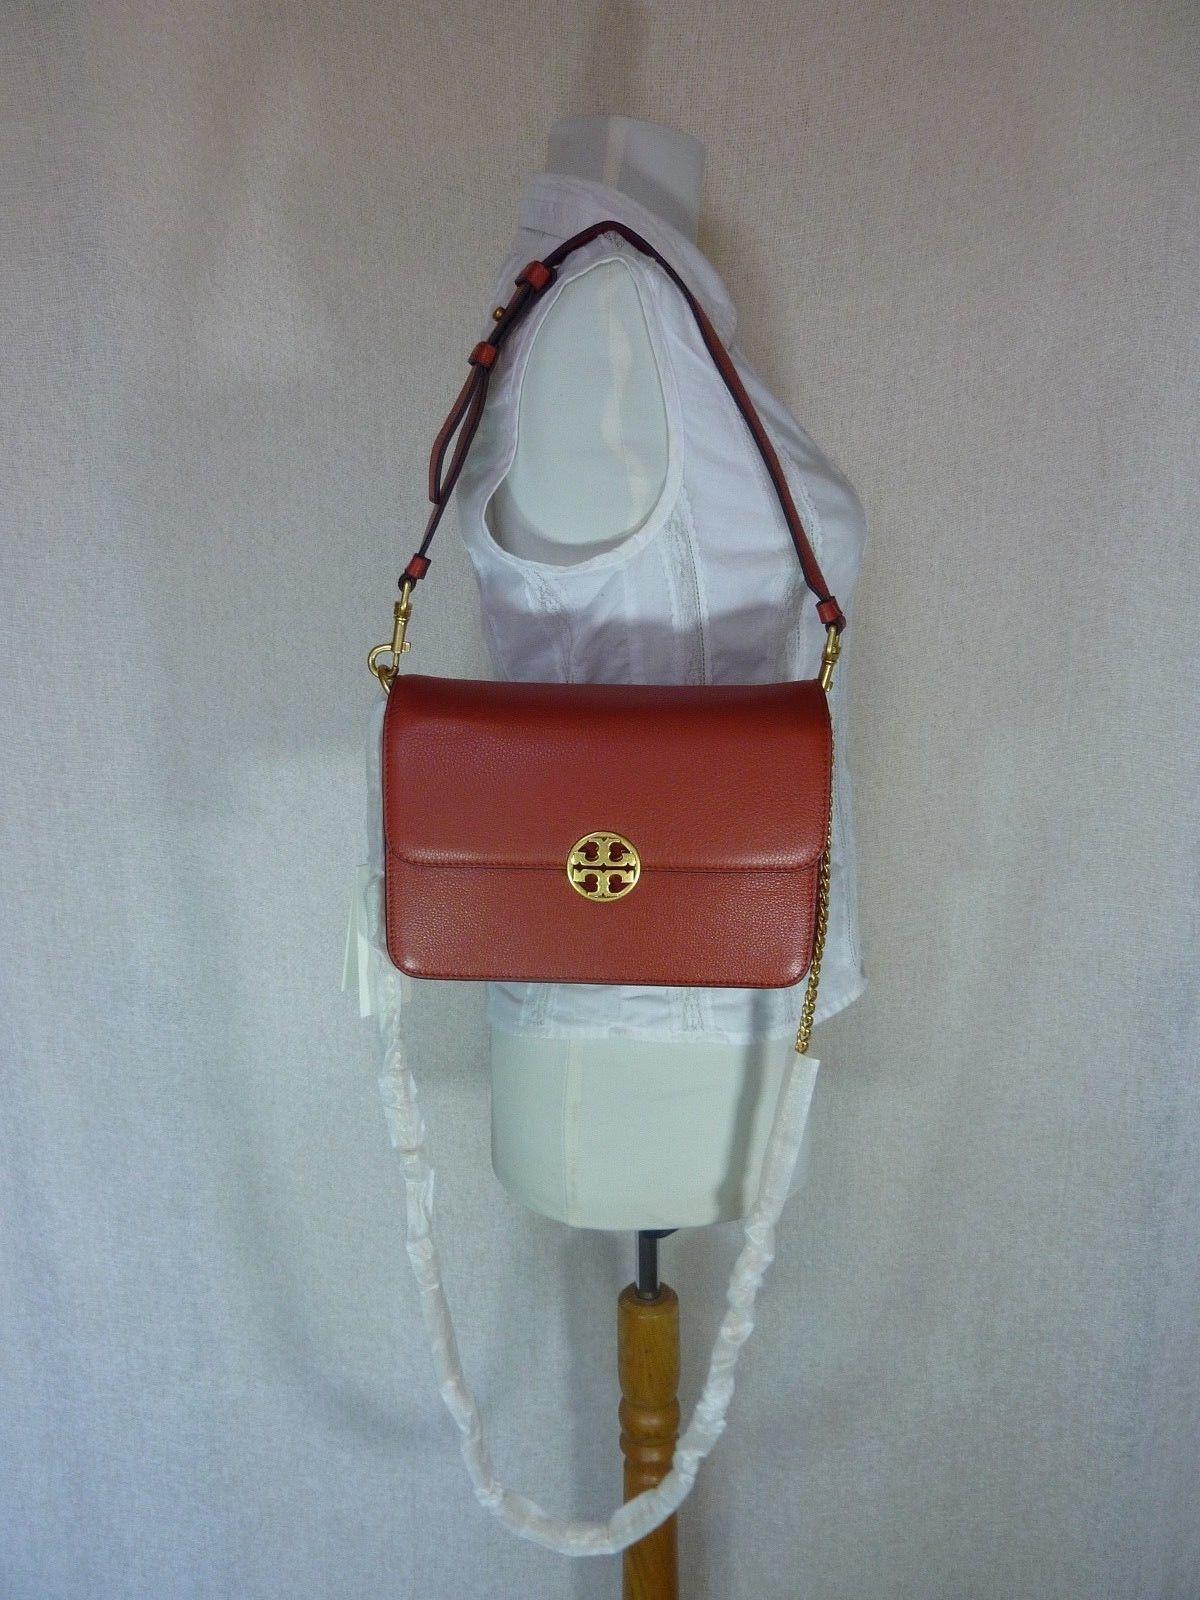 NWT Tory Burch Kola Chelsea Convertible Shoulder Bag  - $498